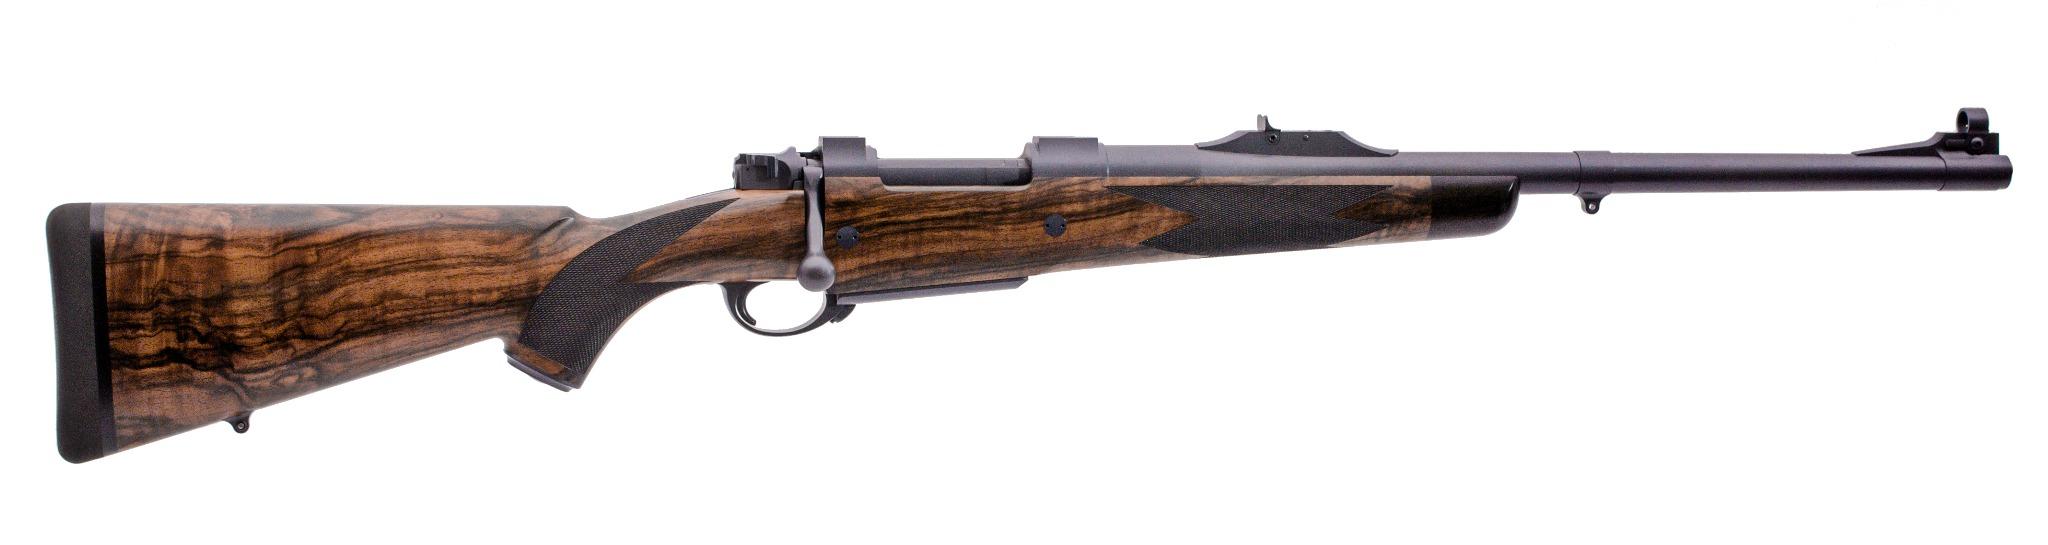 Ryan Breeding Jeffery dangerous big game rifle